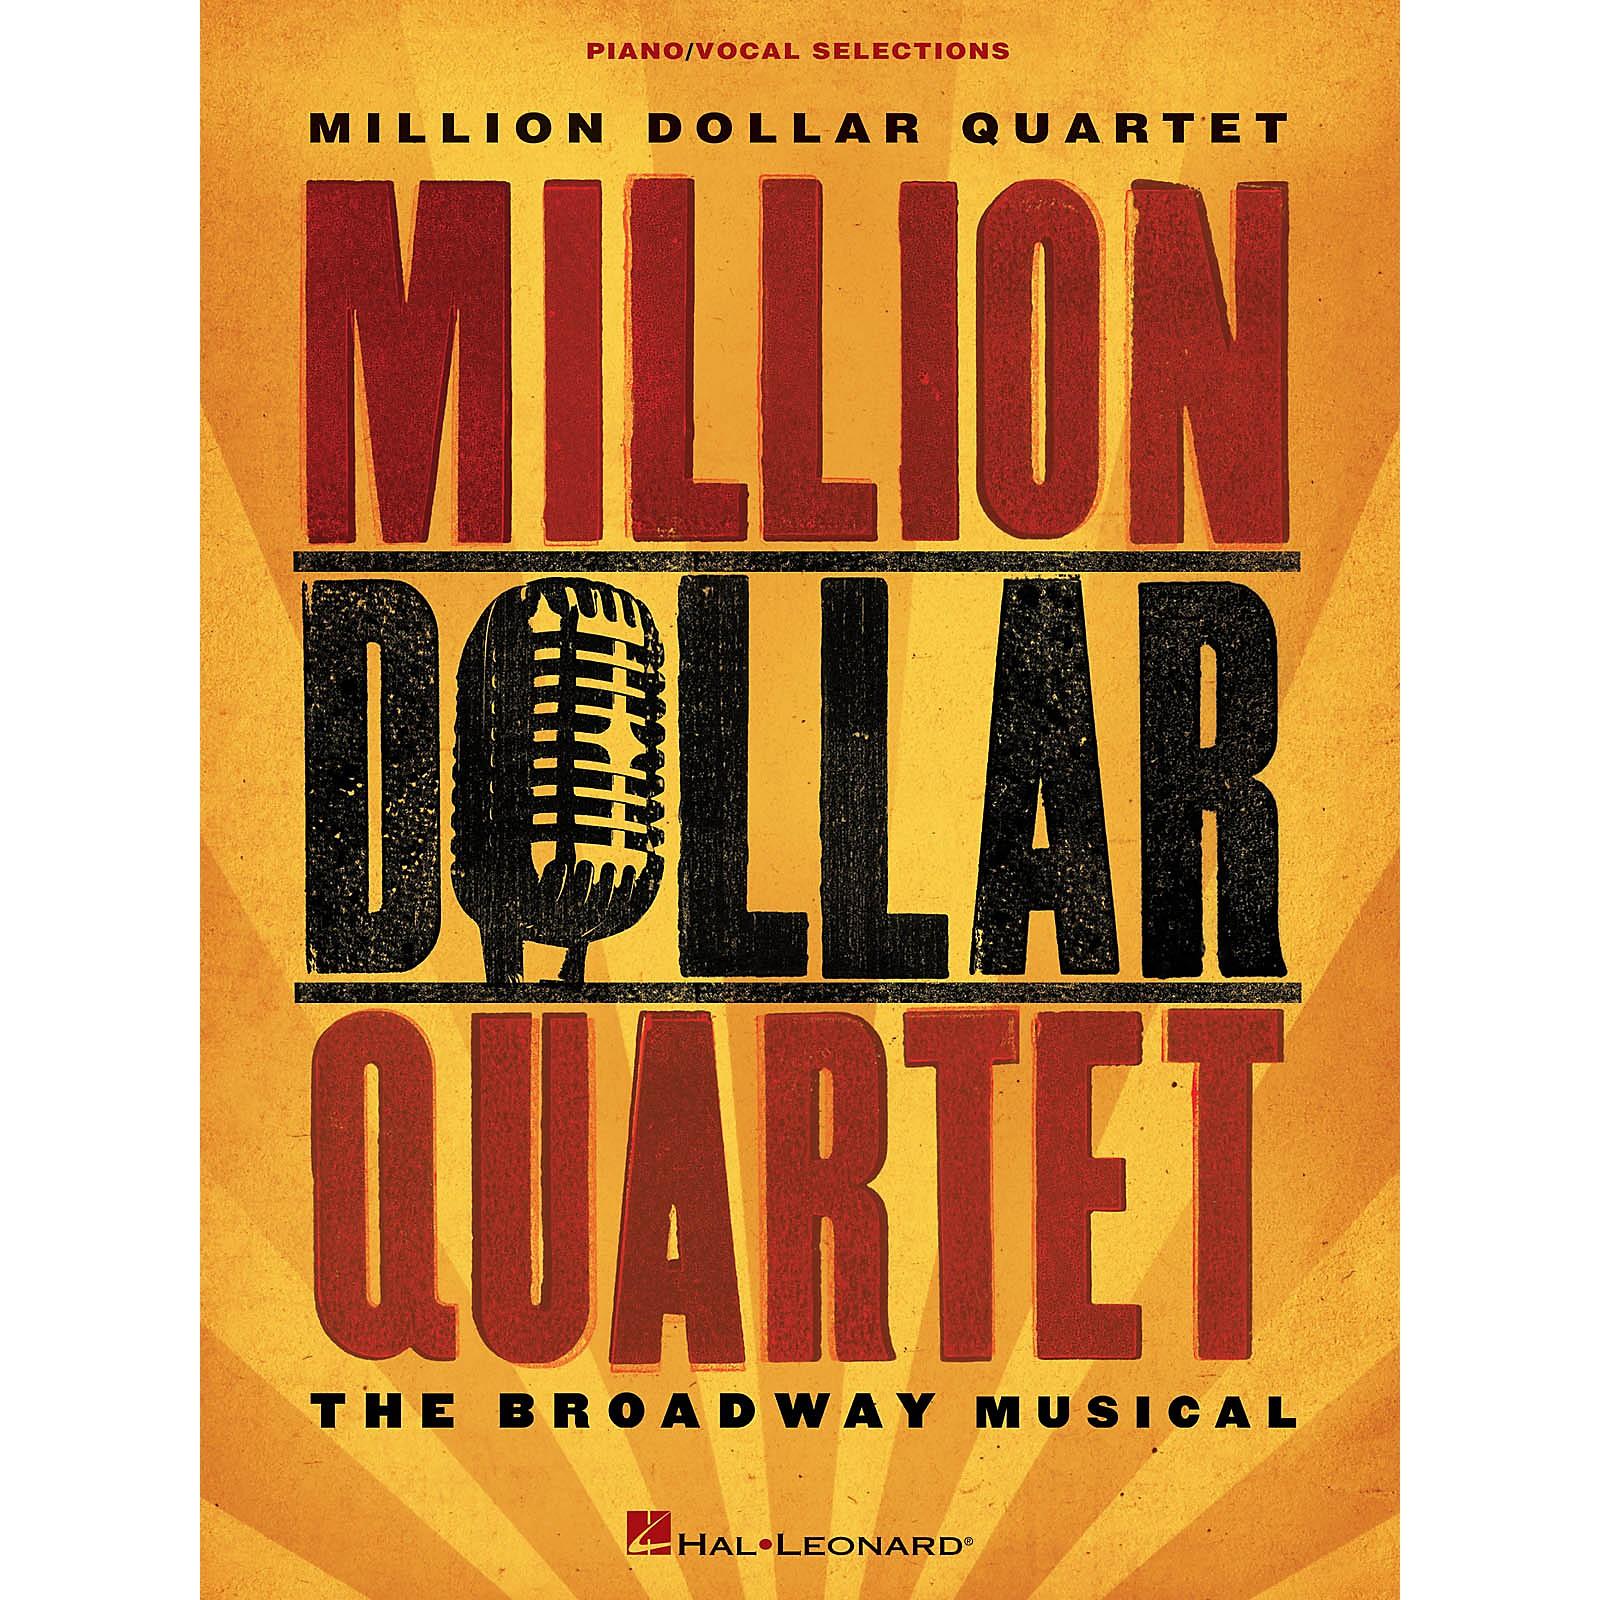 Hal Leonard Million Dollar Quartet